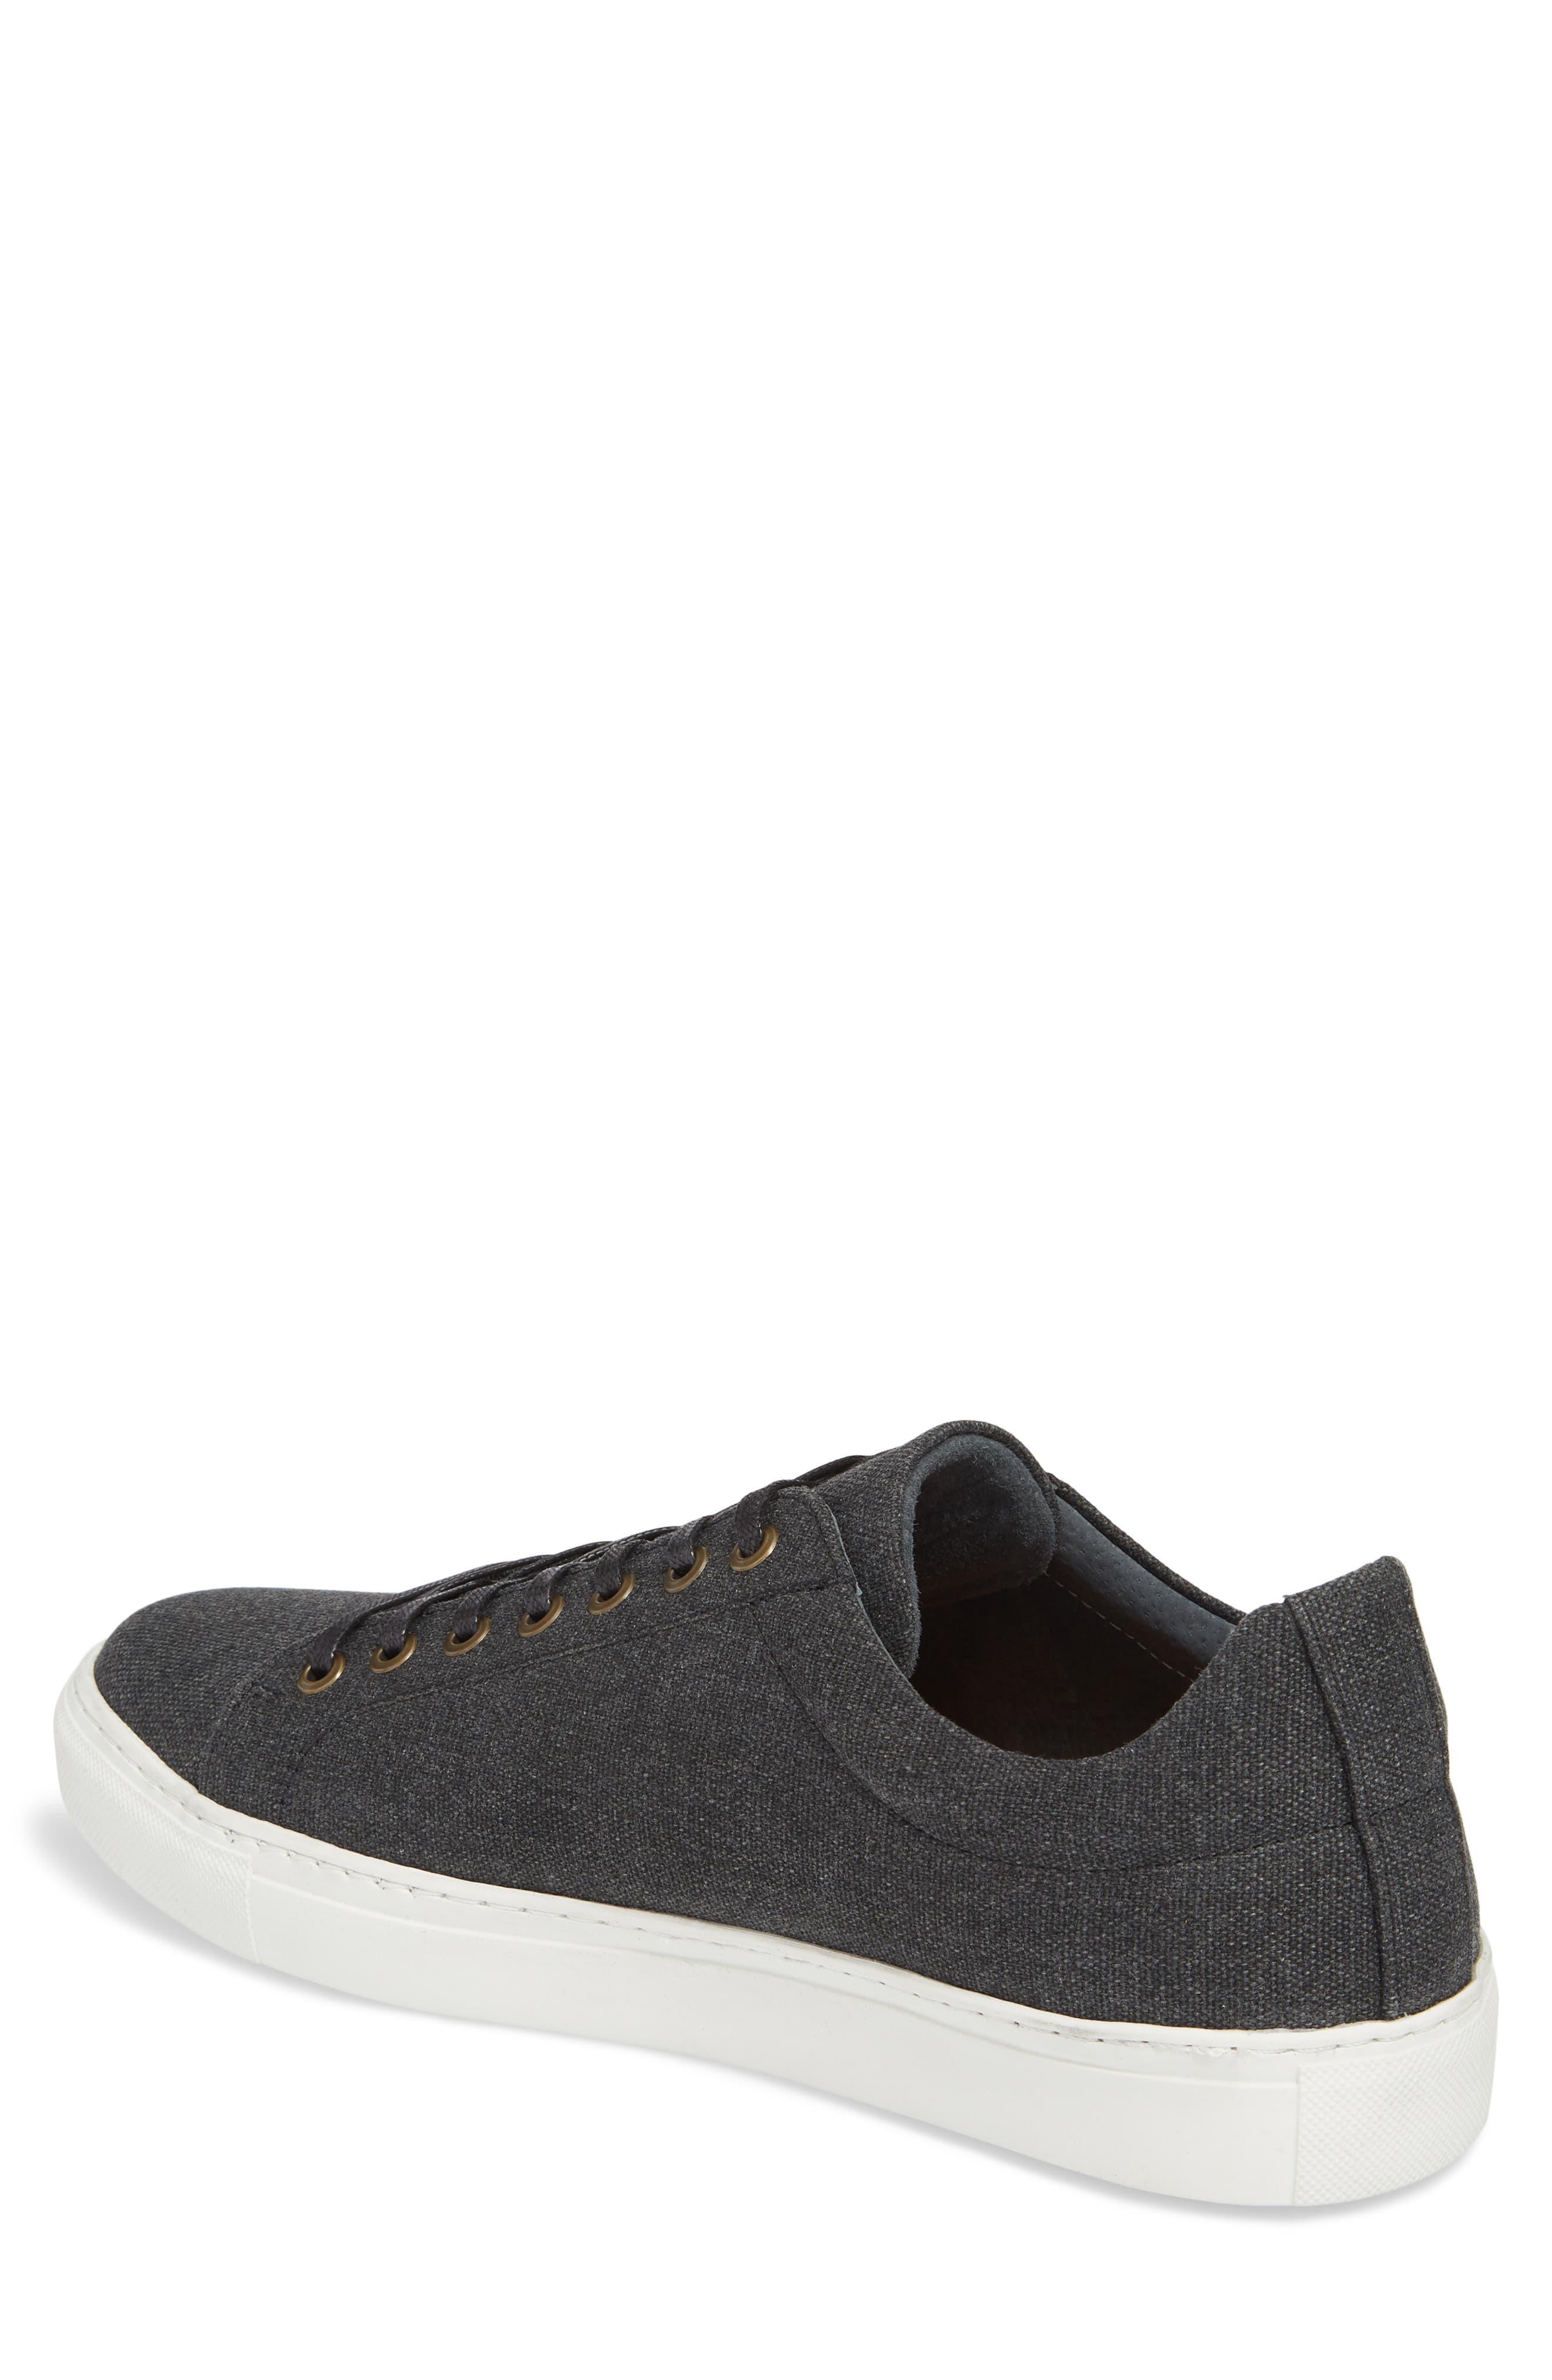 Mark Low Top Sneaker,                             Alternate thumbnail 2, color,                             007